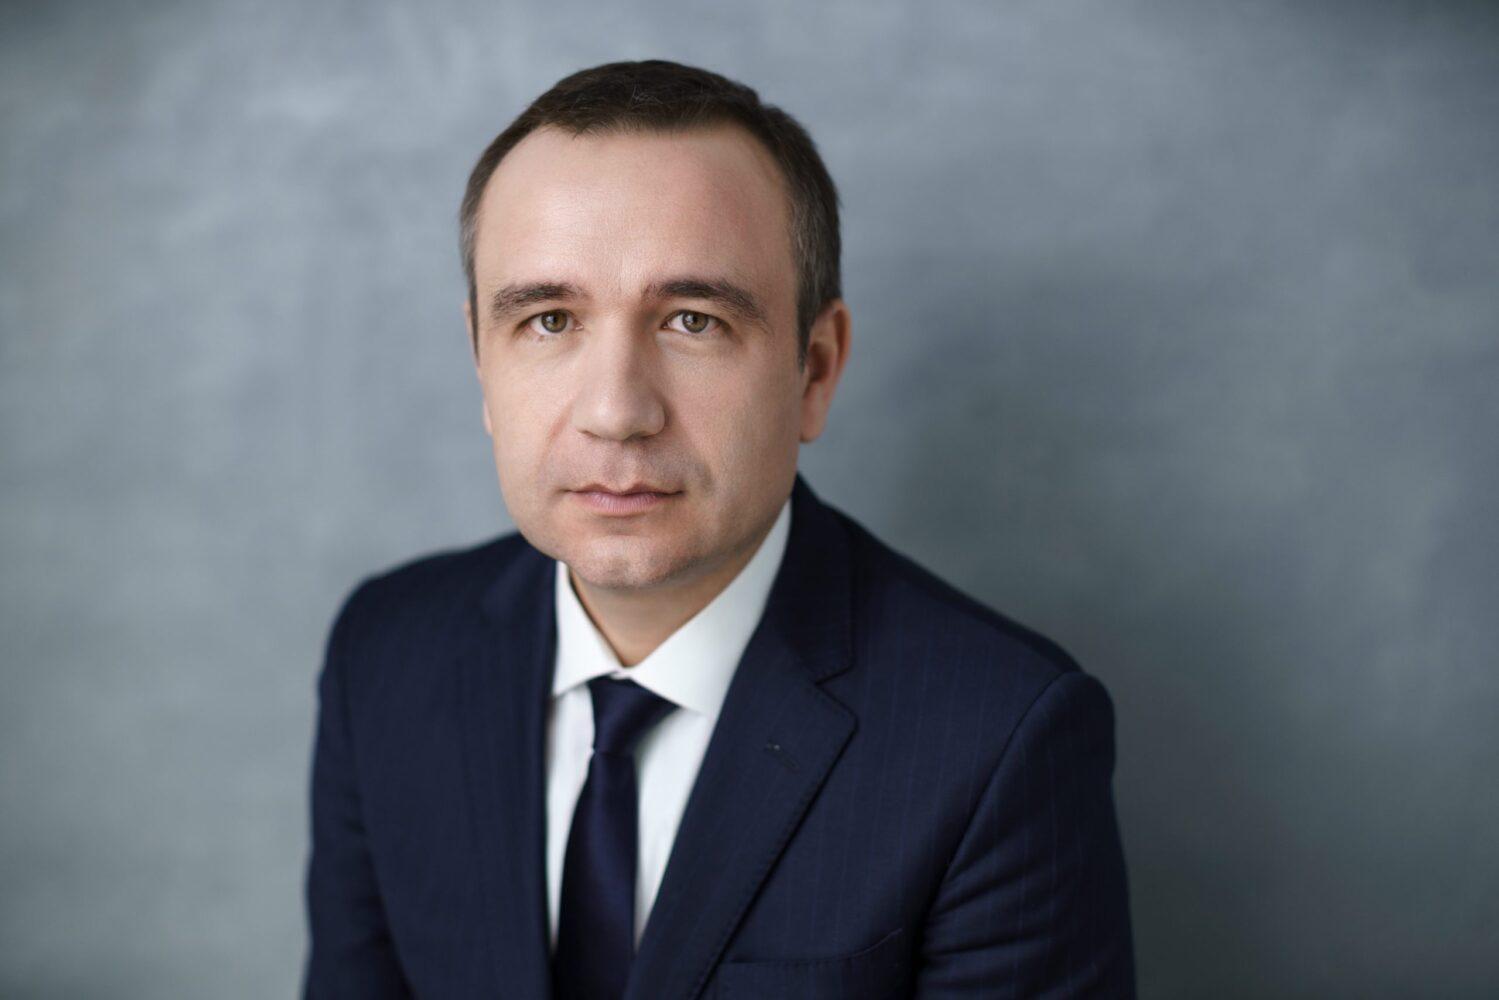 Mircea Bozga, Partener PwC Romania articol Securitatea cibernetică